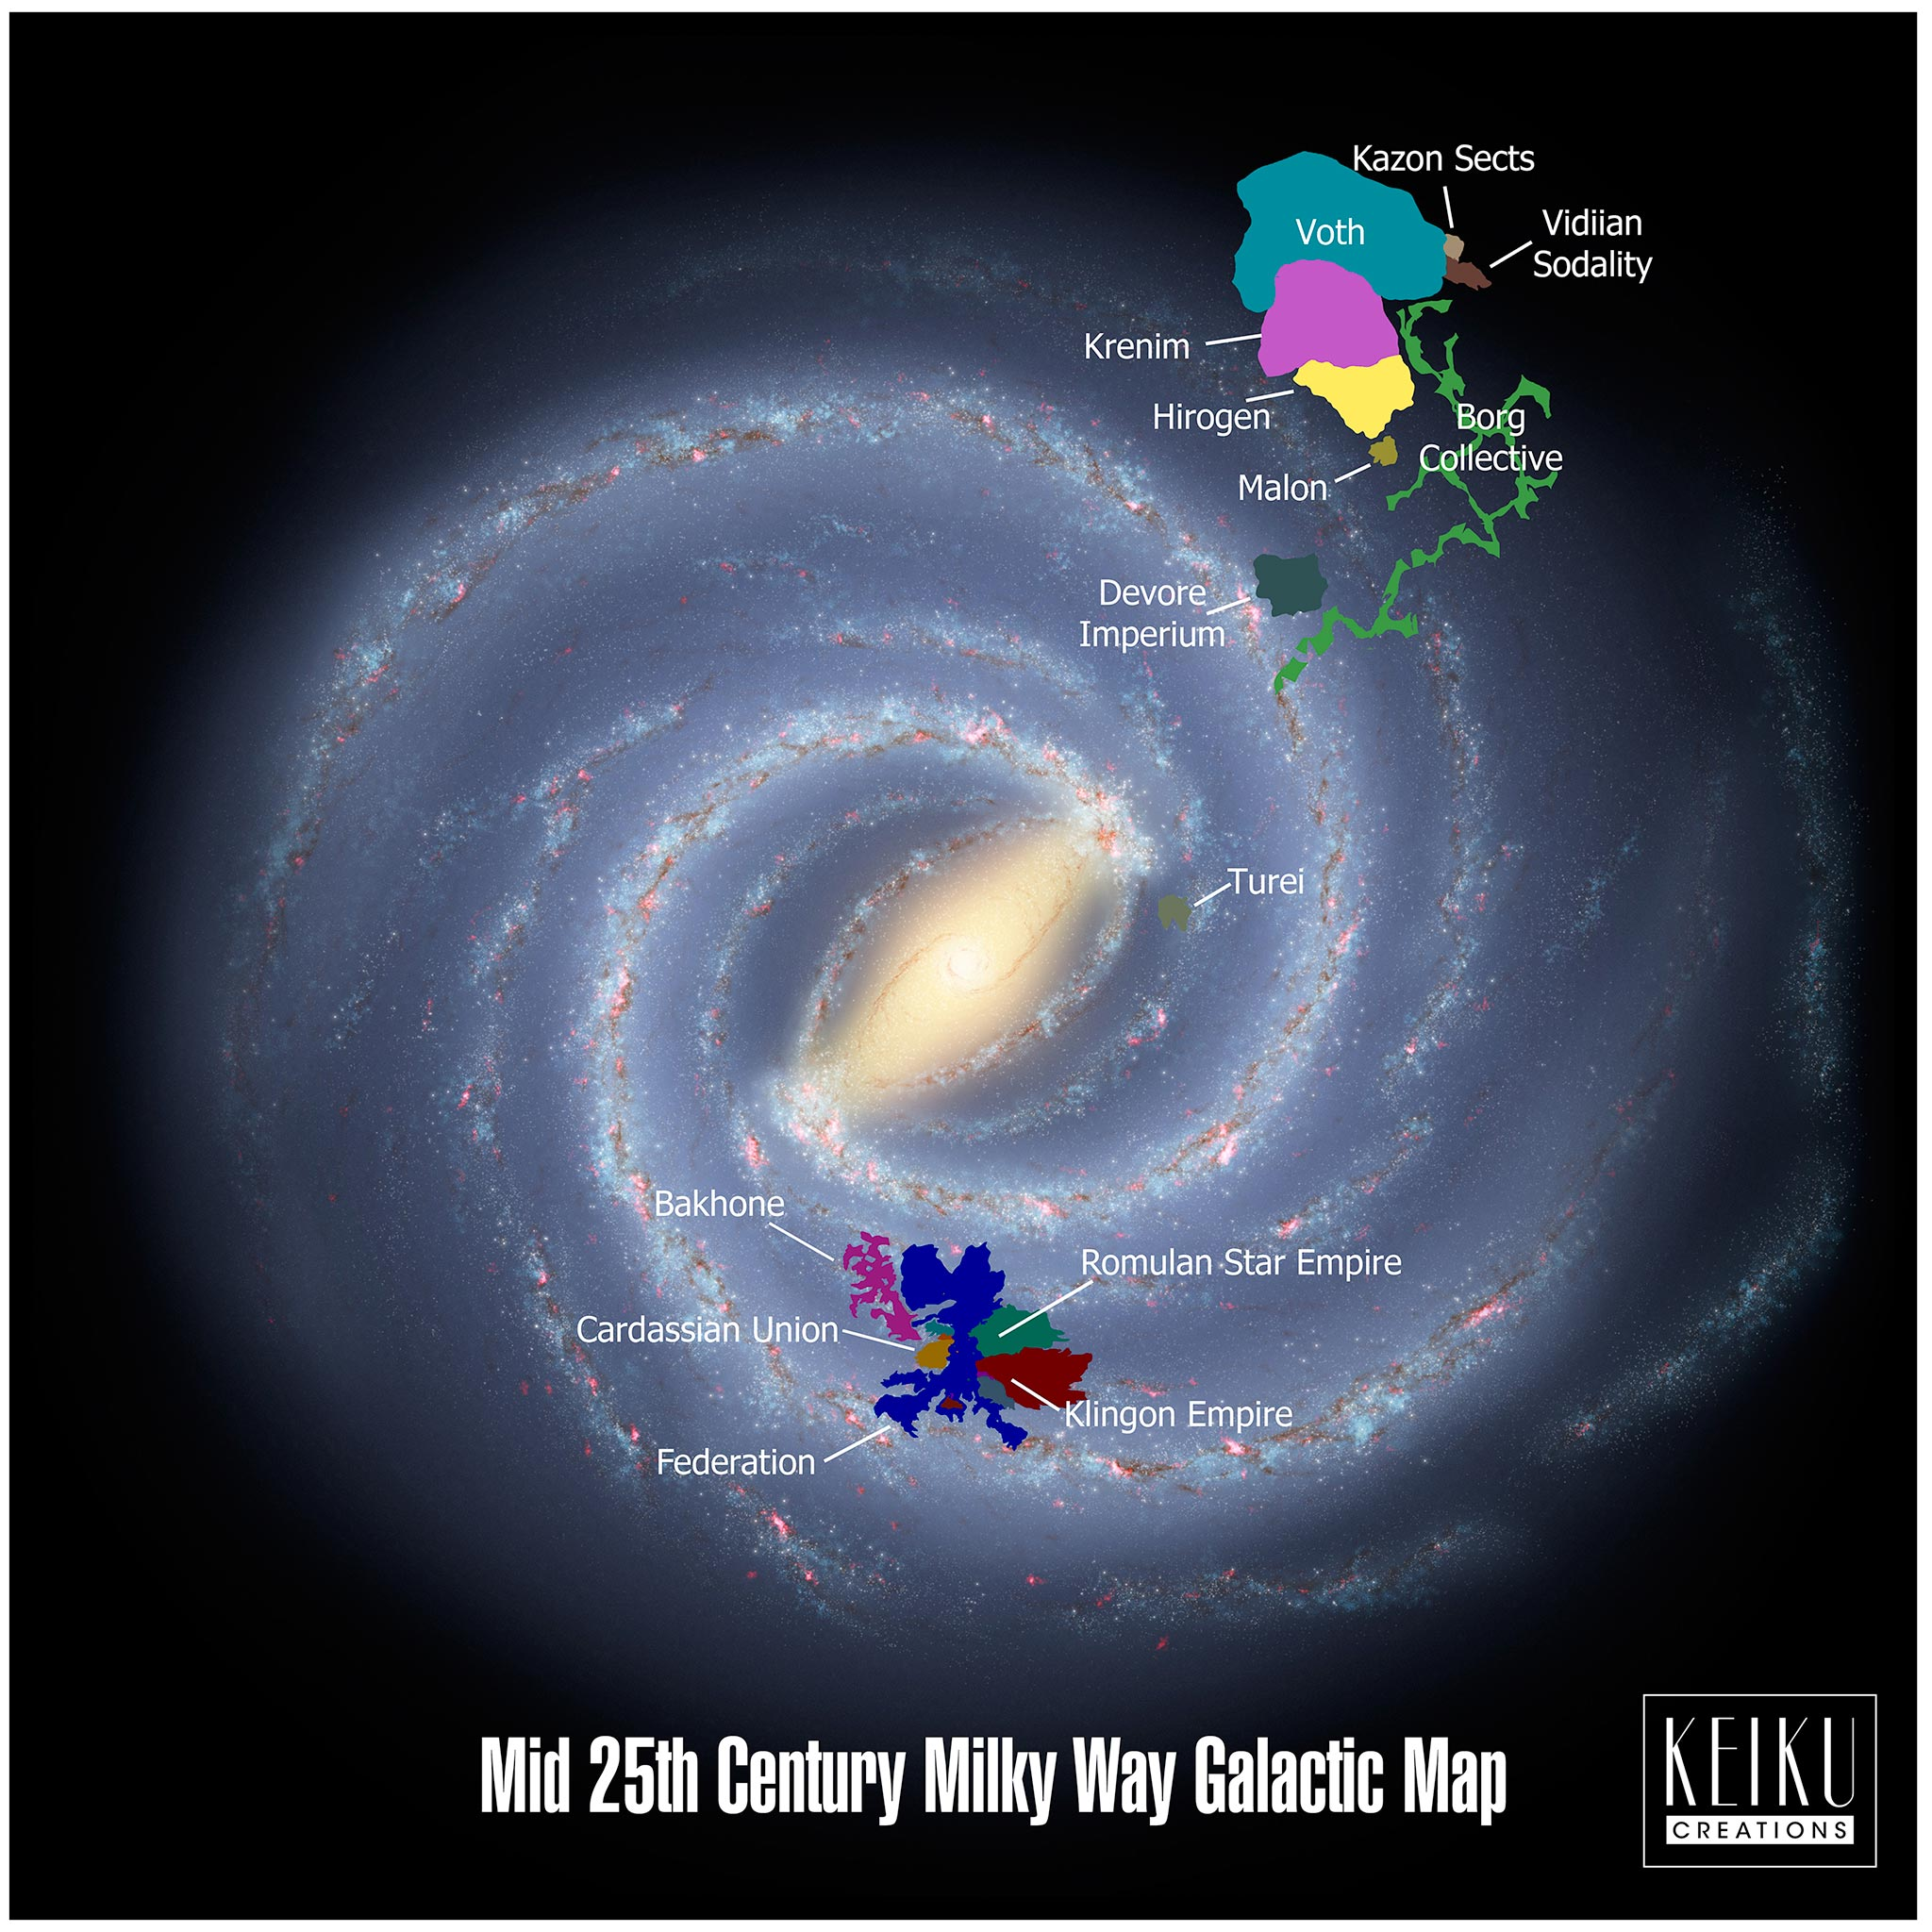 25th Century Galactic Map